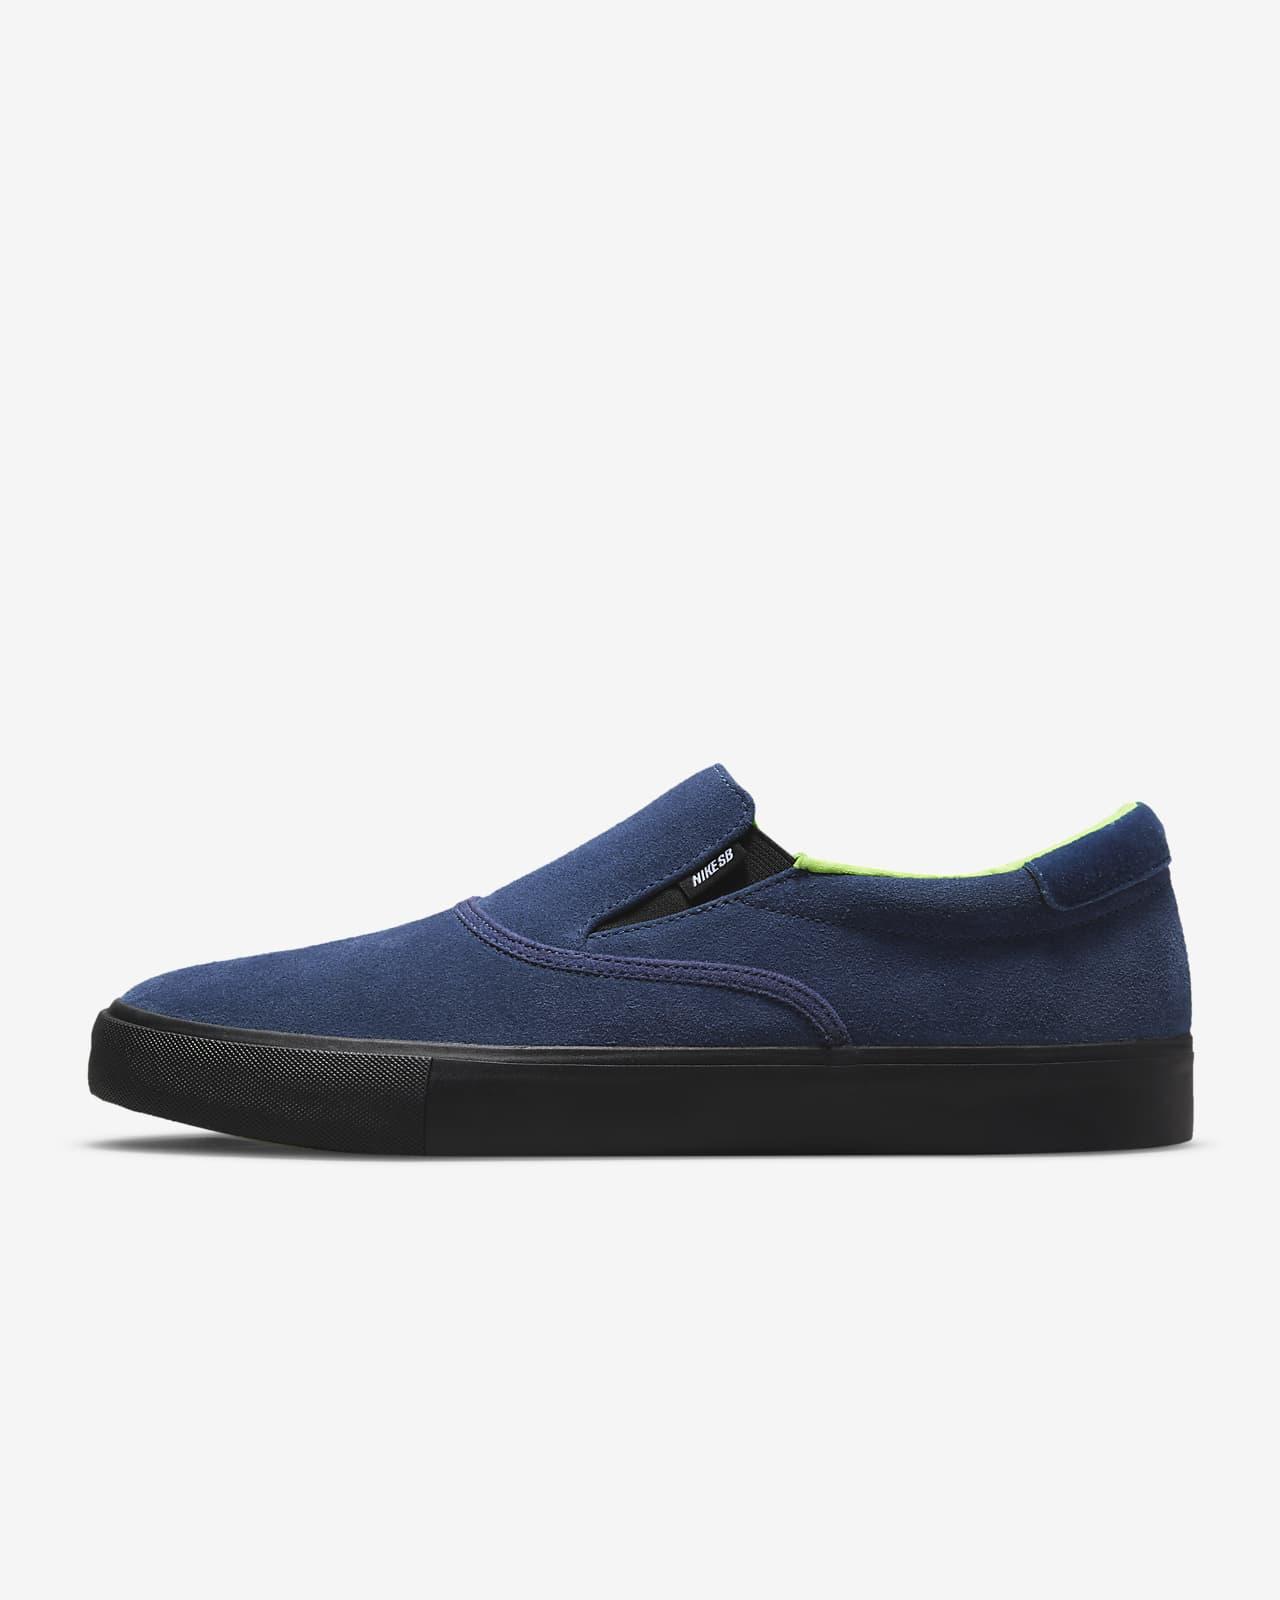 Chaussure de skateboard Nike SB Zoom Verona Slip x Leo Baker